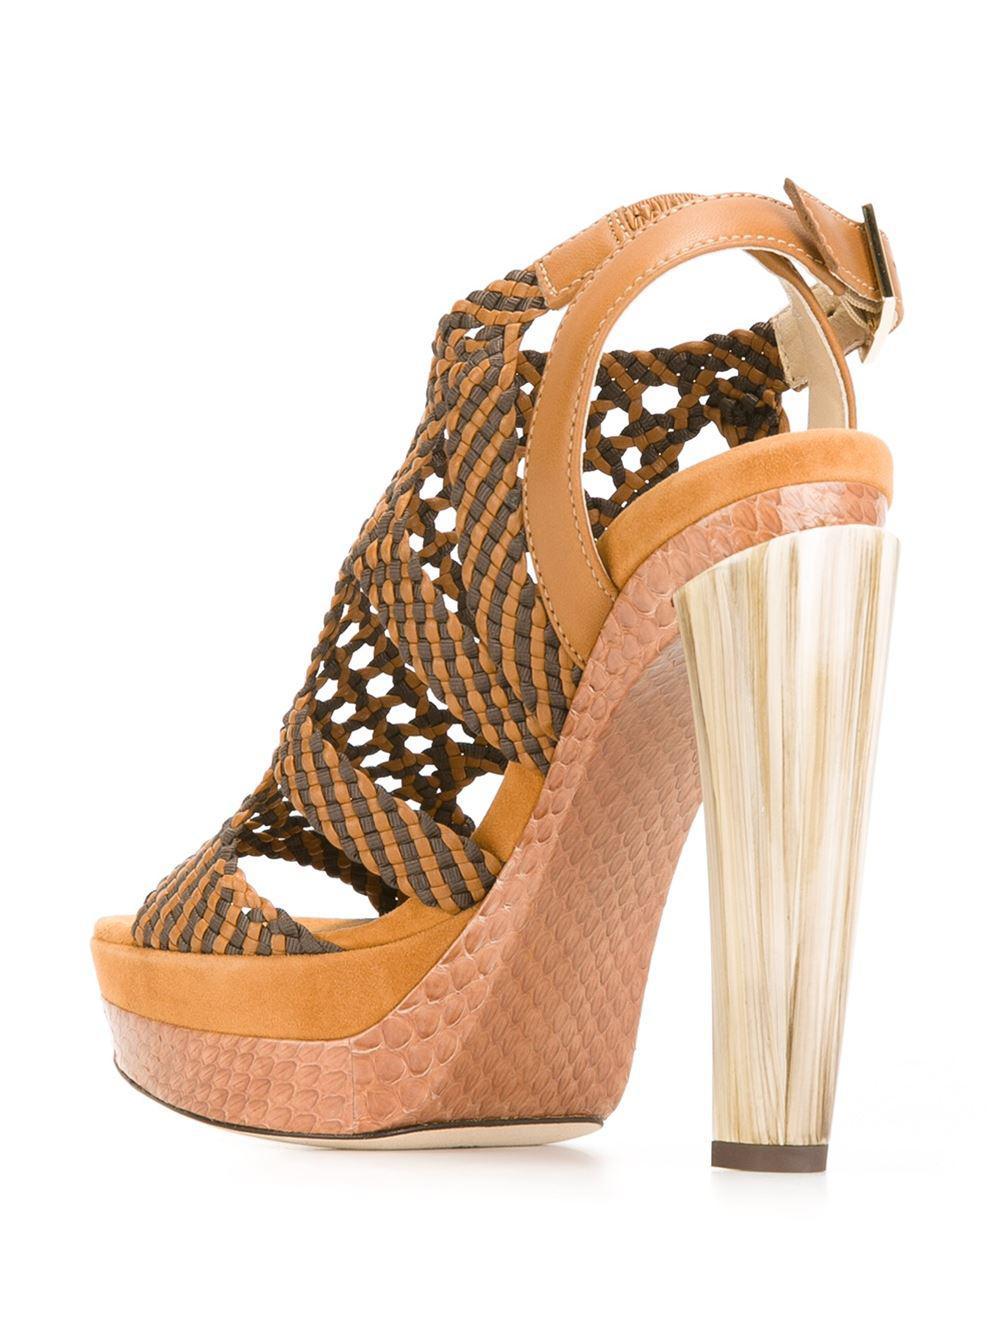 3feb7c8c2e08 Jimmy Choo  taytum 130  Sandals in Red - Lyst